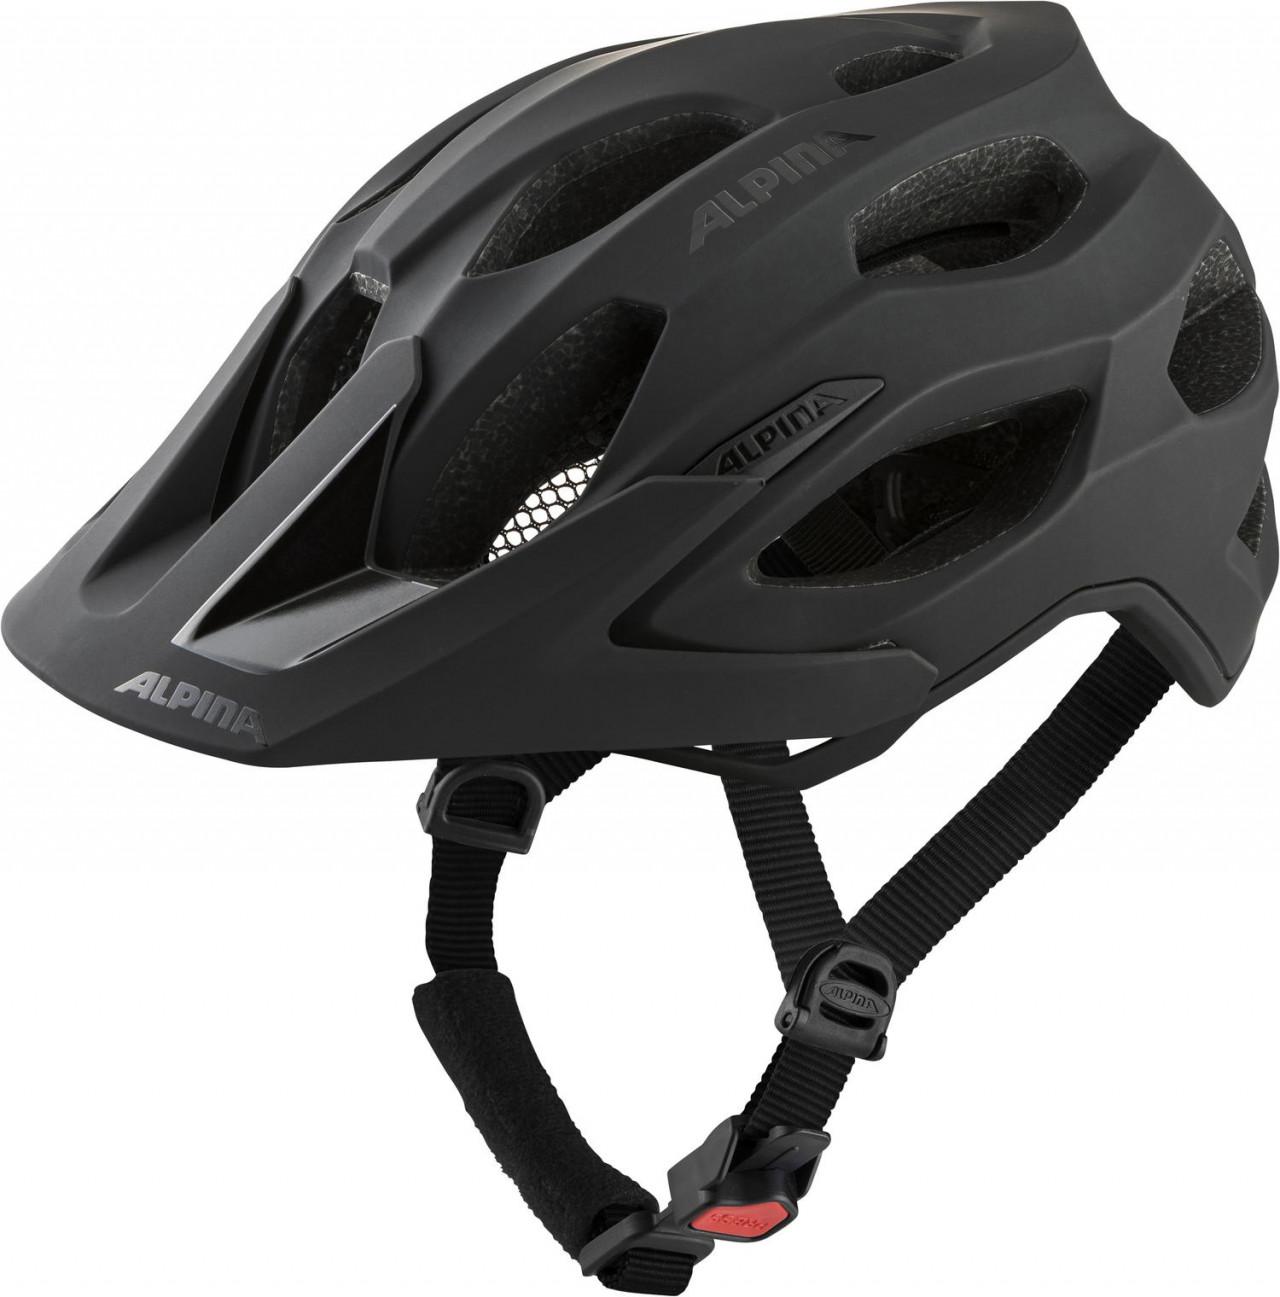 ALPINA Cyklistická prilba Carapax 2.0 čierna mat Veľkosť : M